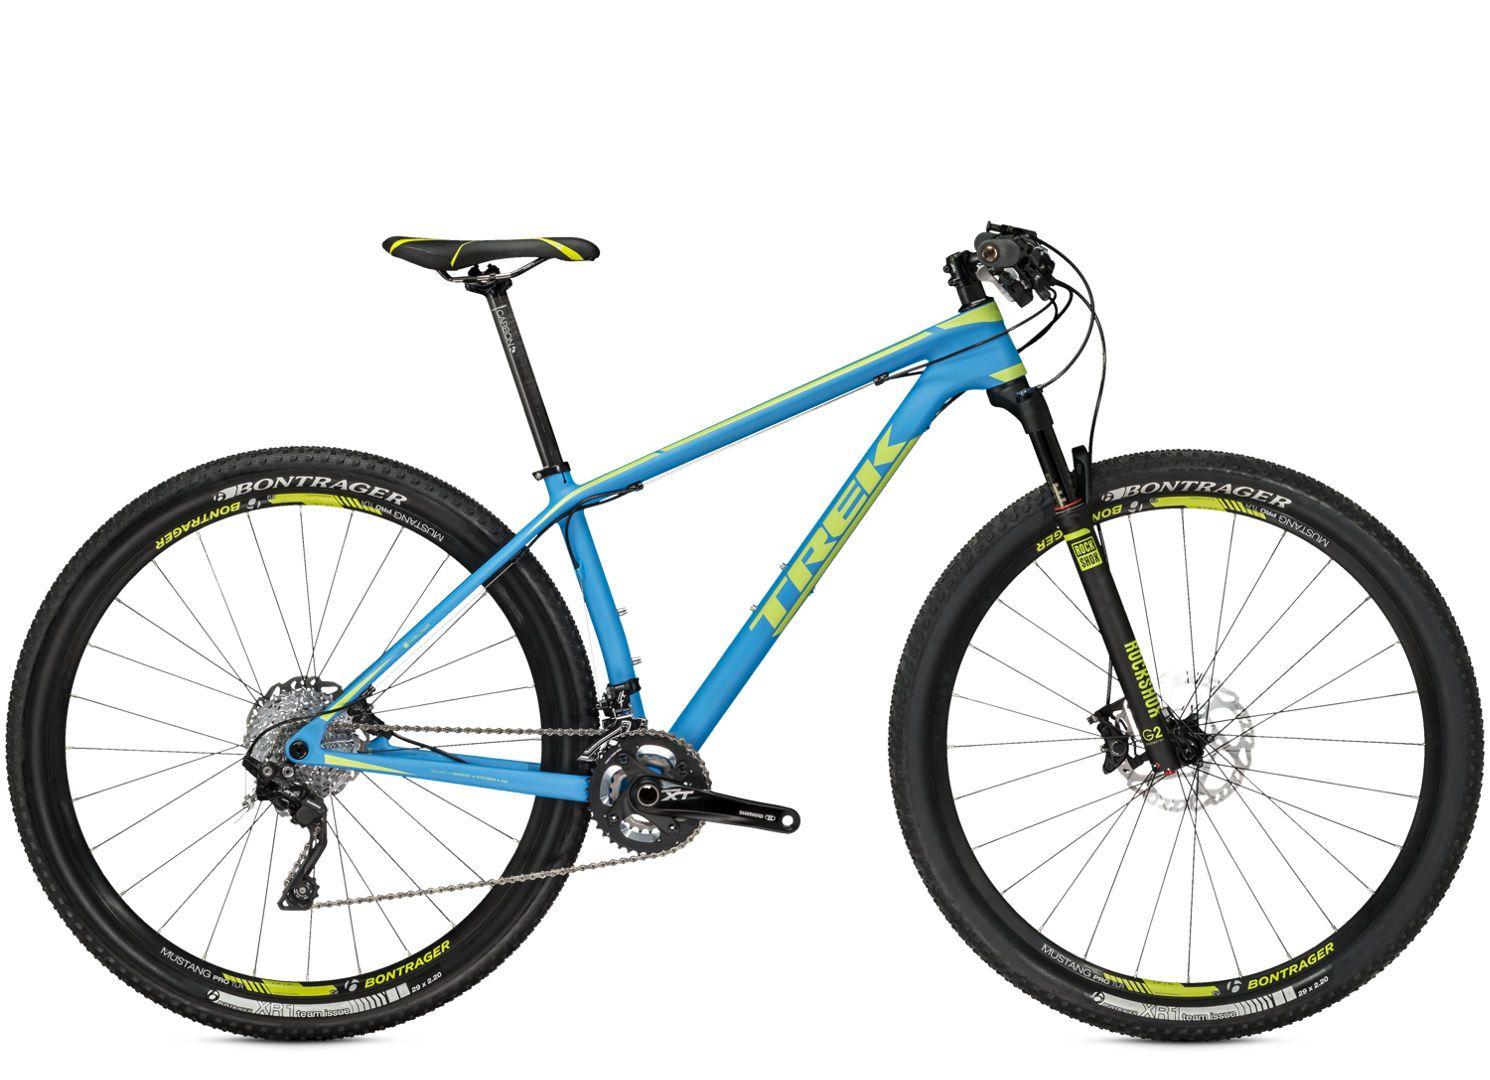 104d3caaf6a bike 2015 #Superfly | MTB | Gary fisher, Trek bikes, Scott scale